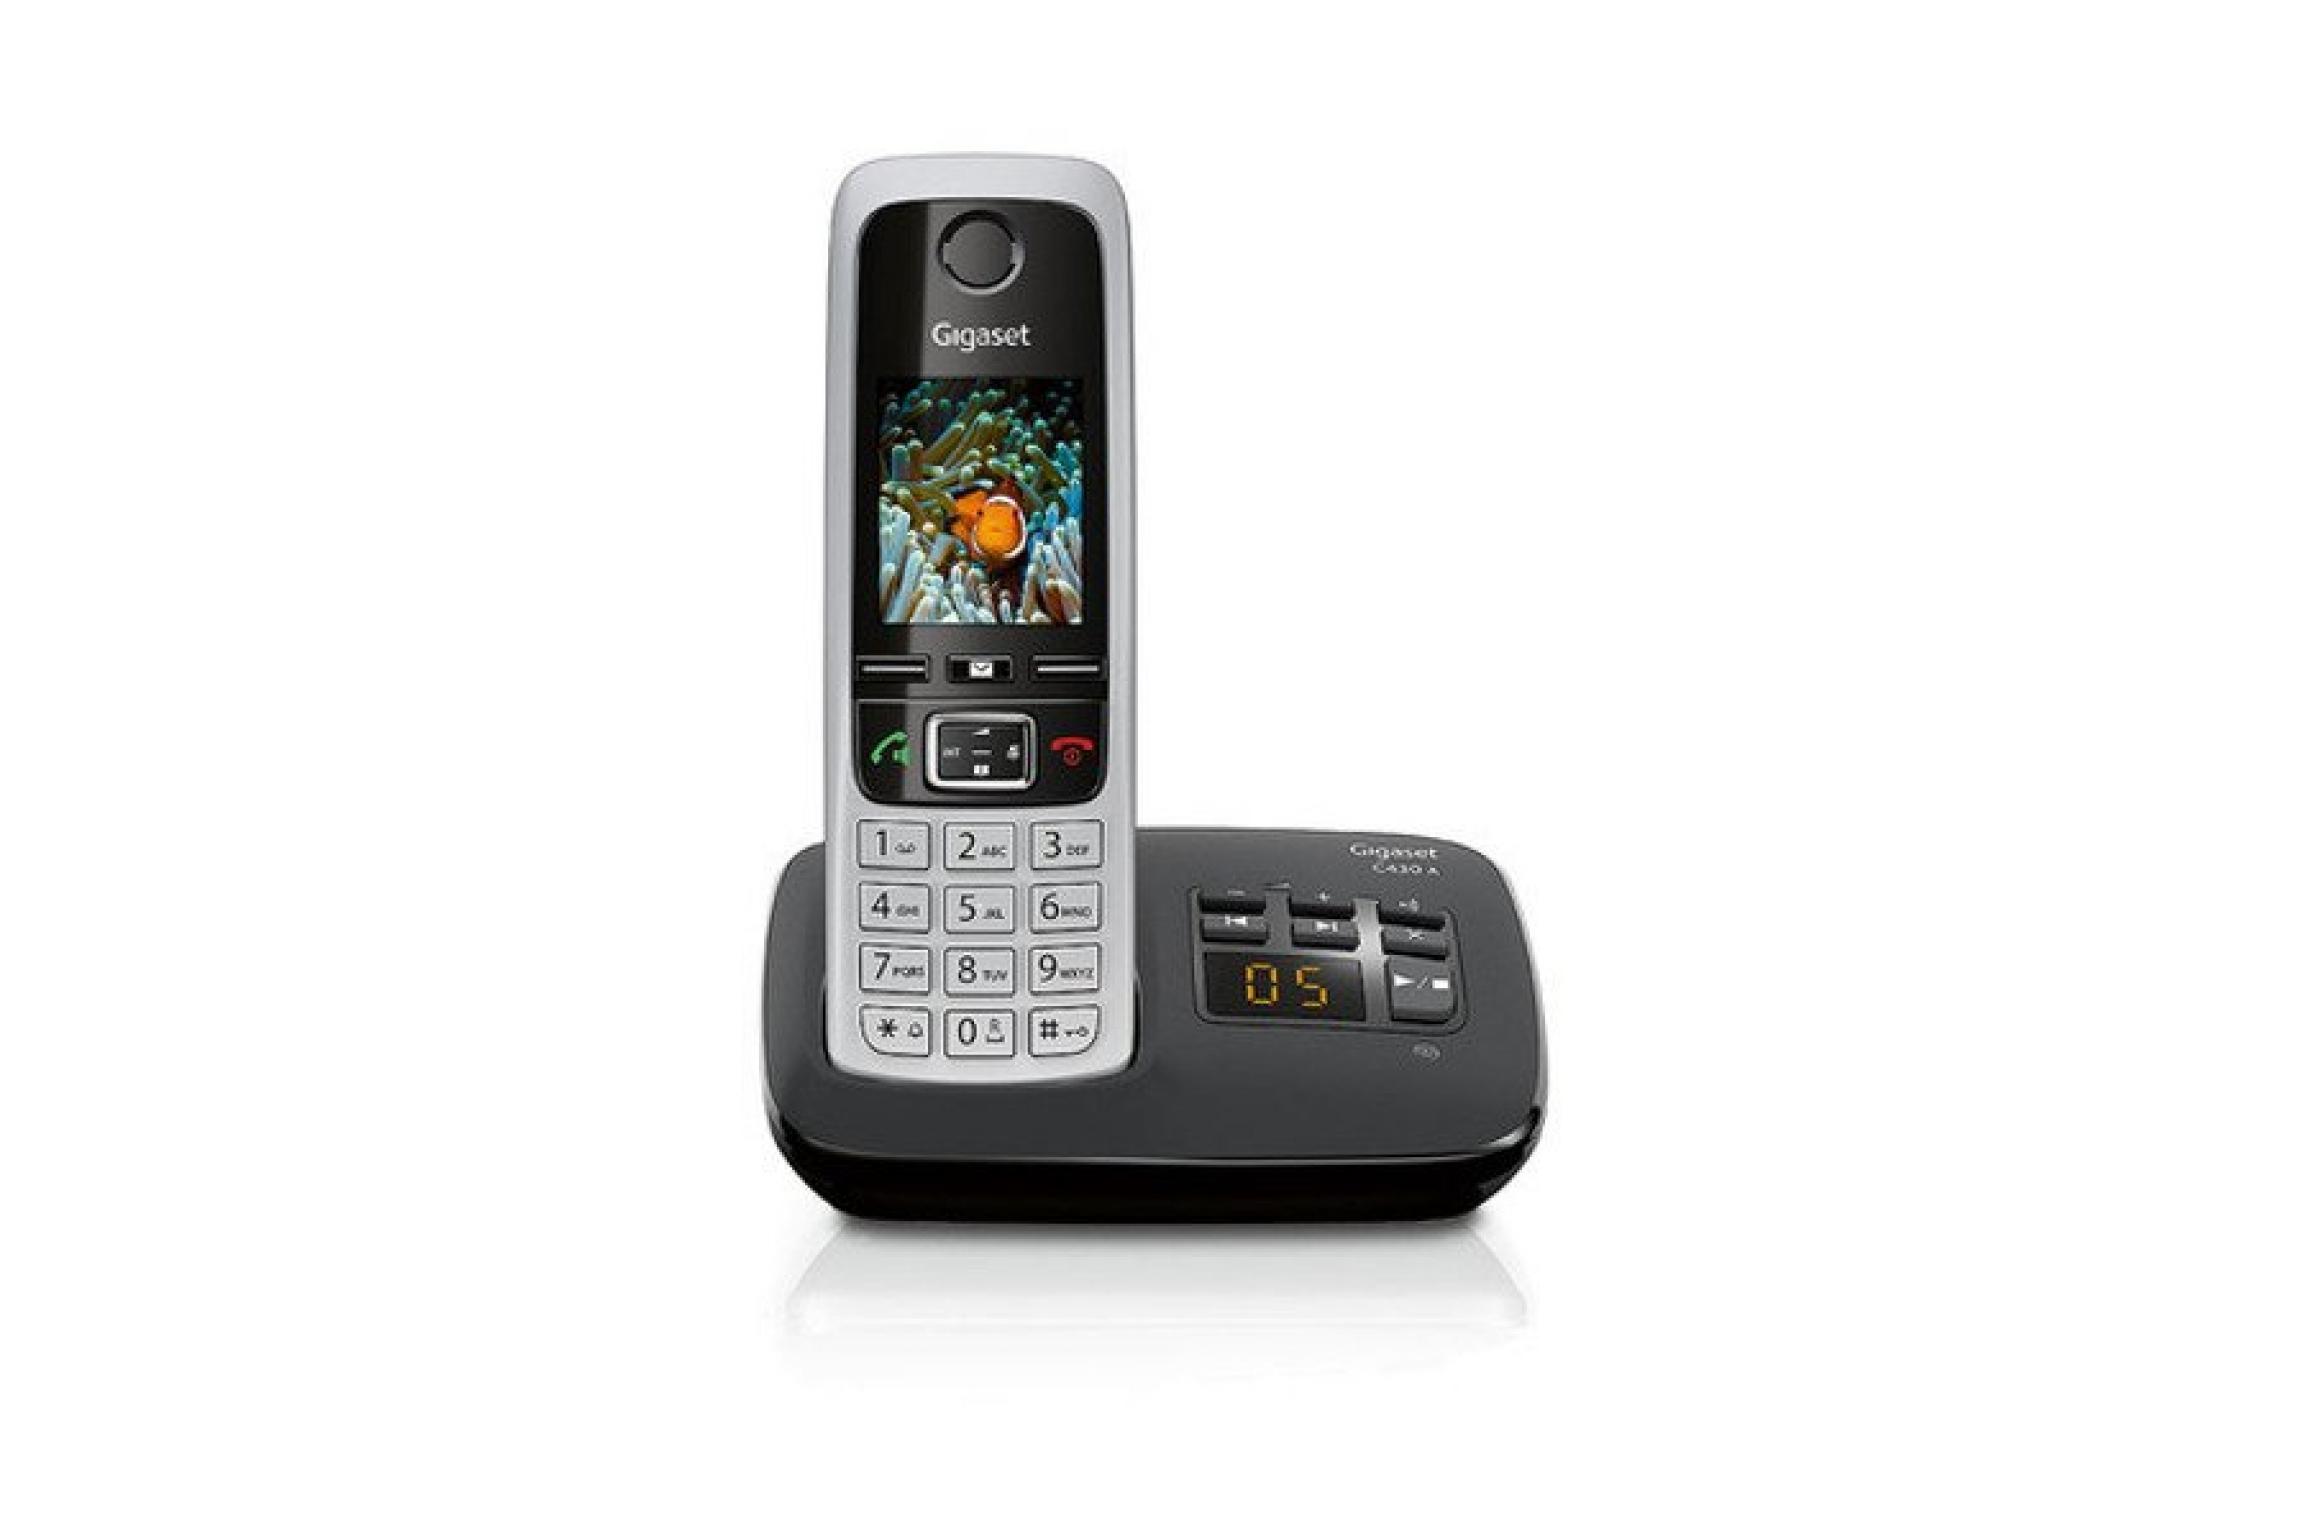 telefon mit anrufbeantworter test 2017 top 7 telefone. Black Bedroom Furniture Sets. Home Design Ideas